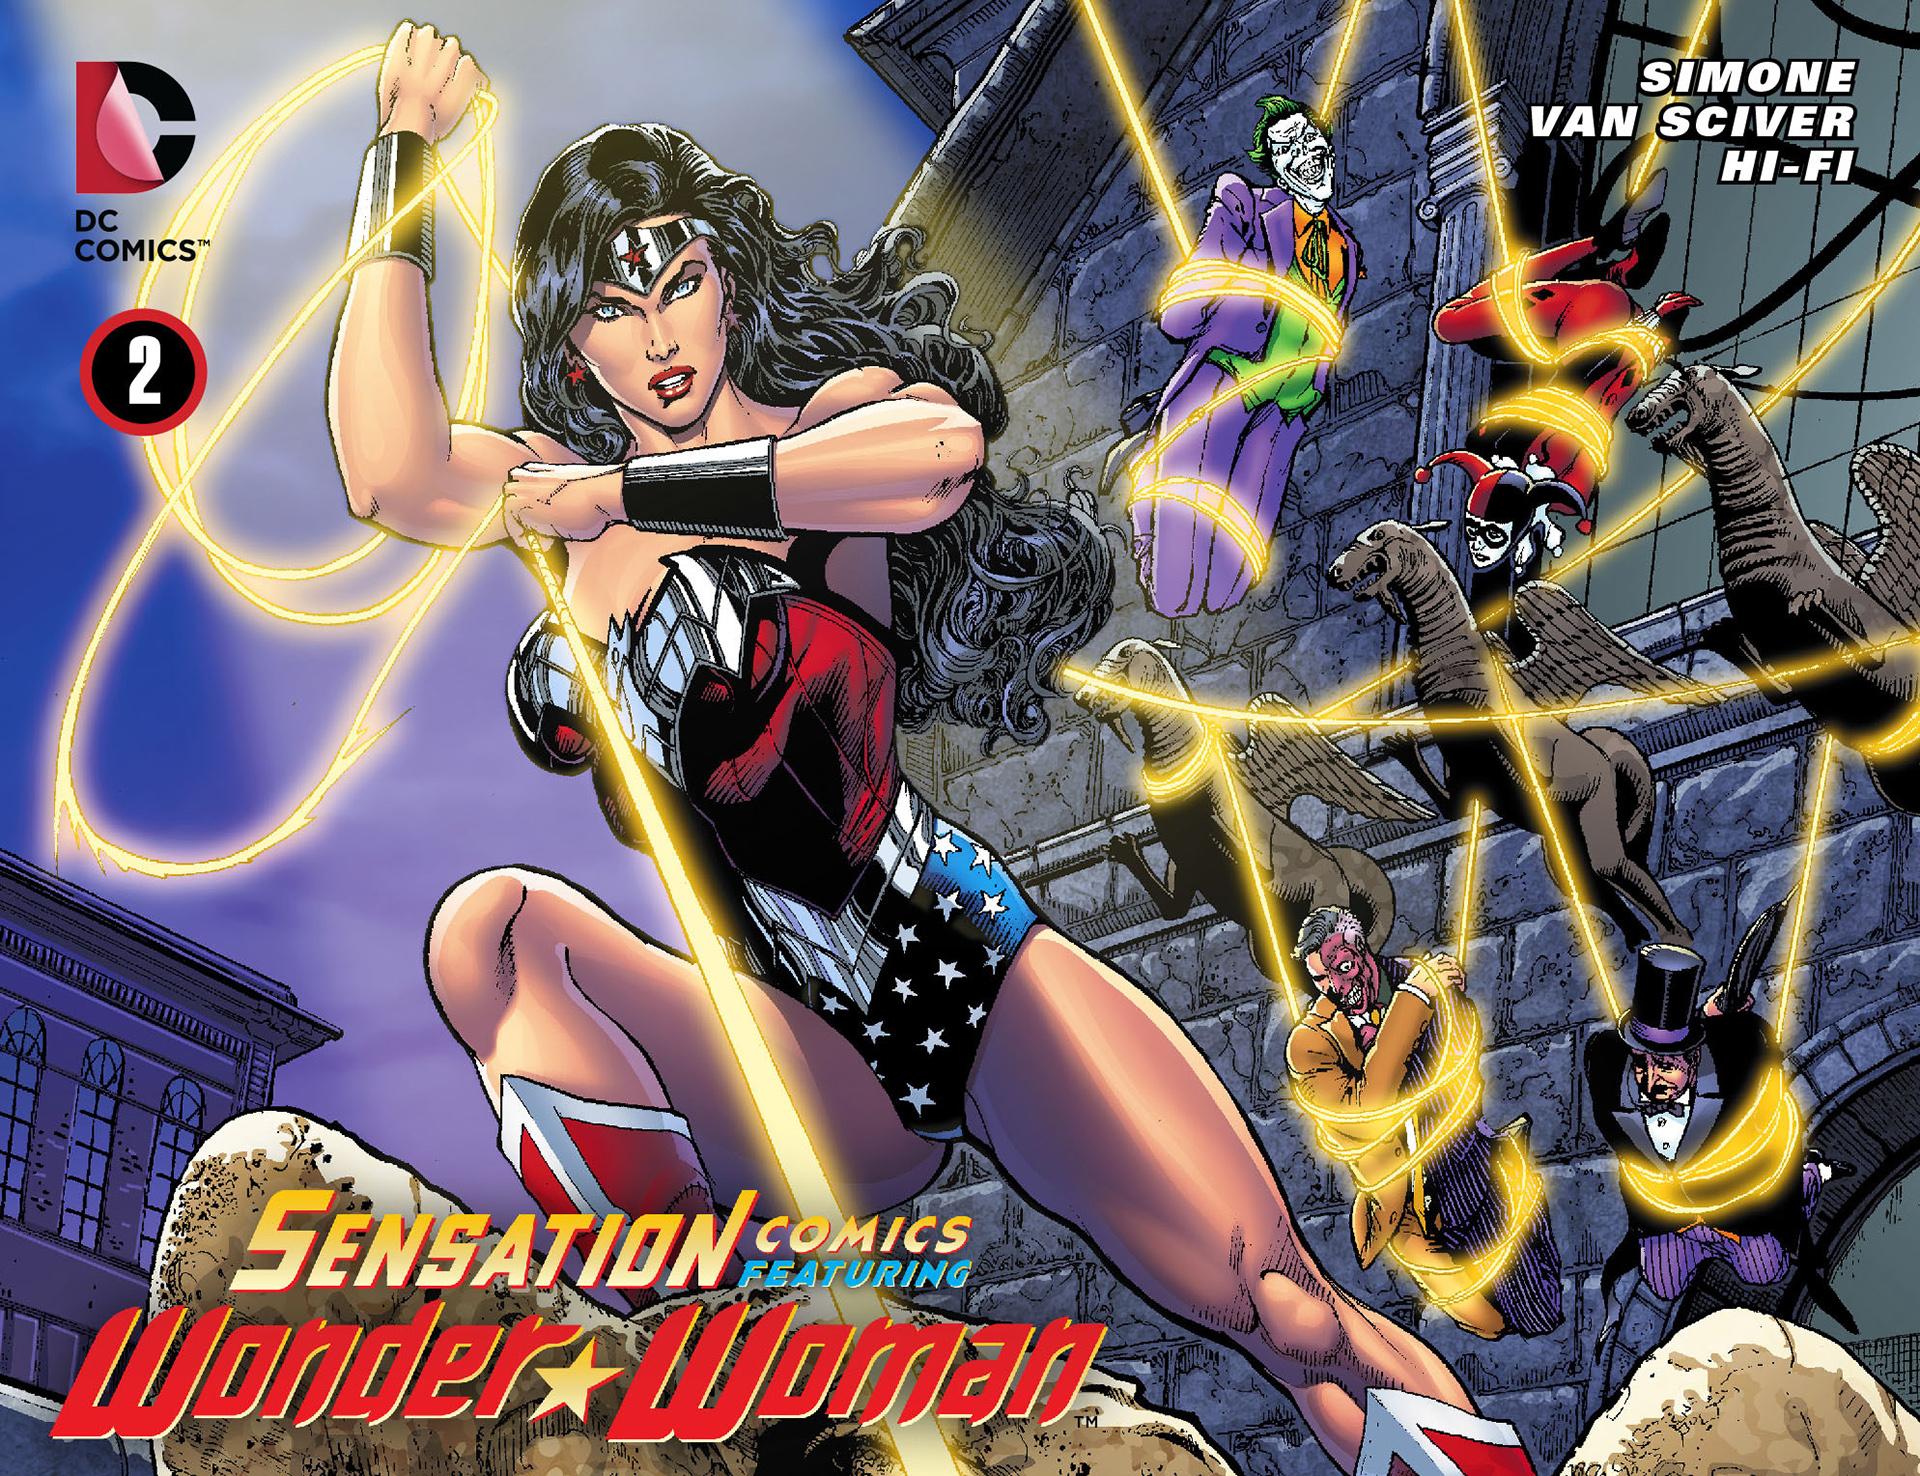 Read online Sensation Comics Featuring Wonder Woman comic -  Issue #2 - 1